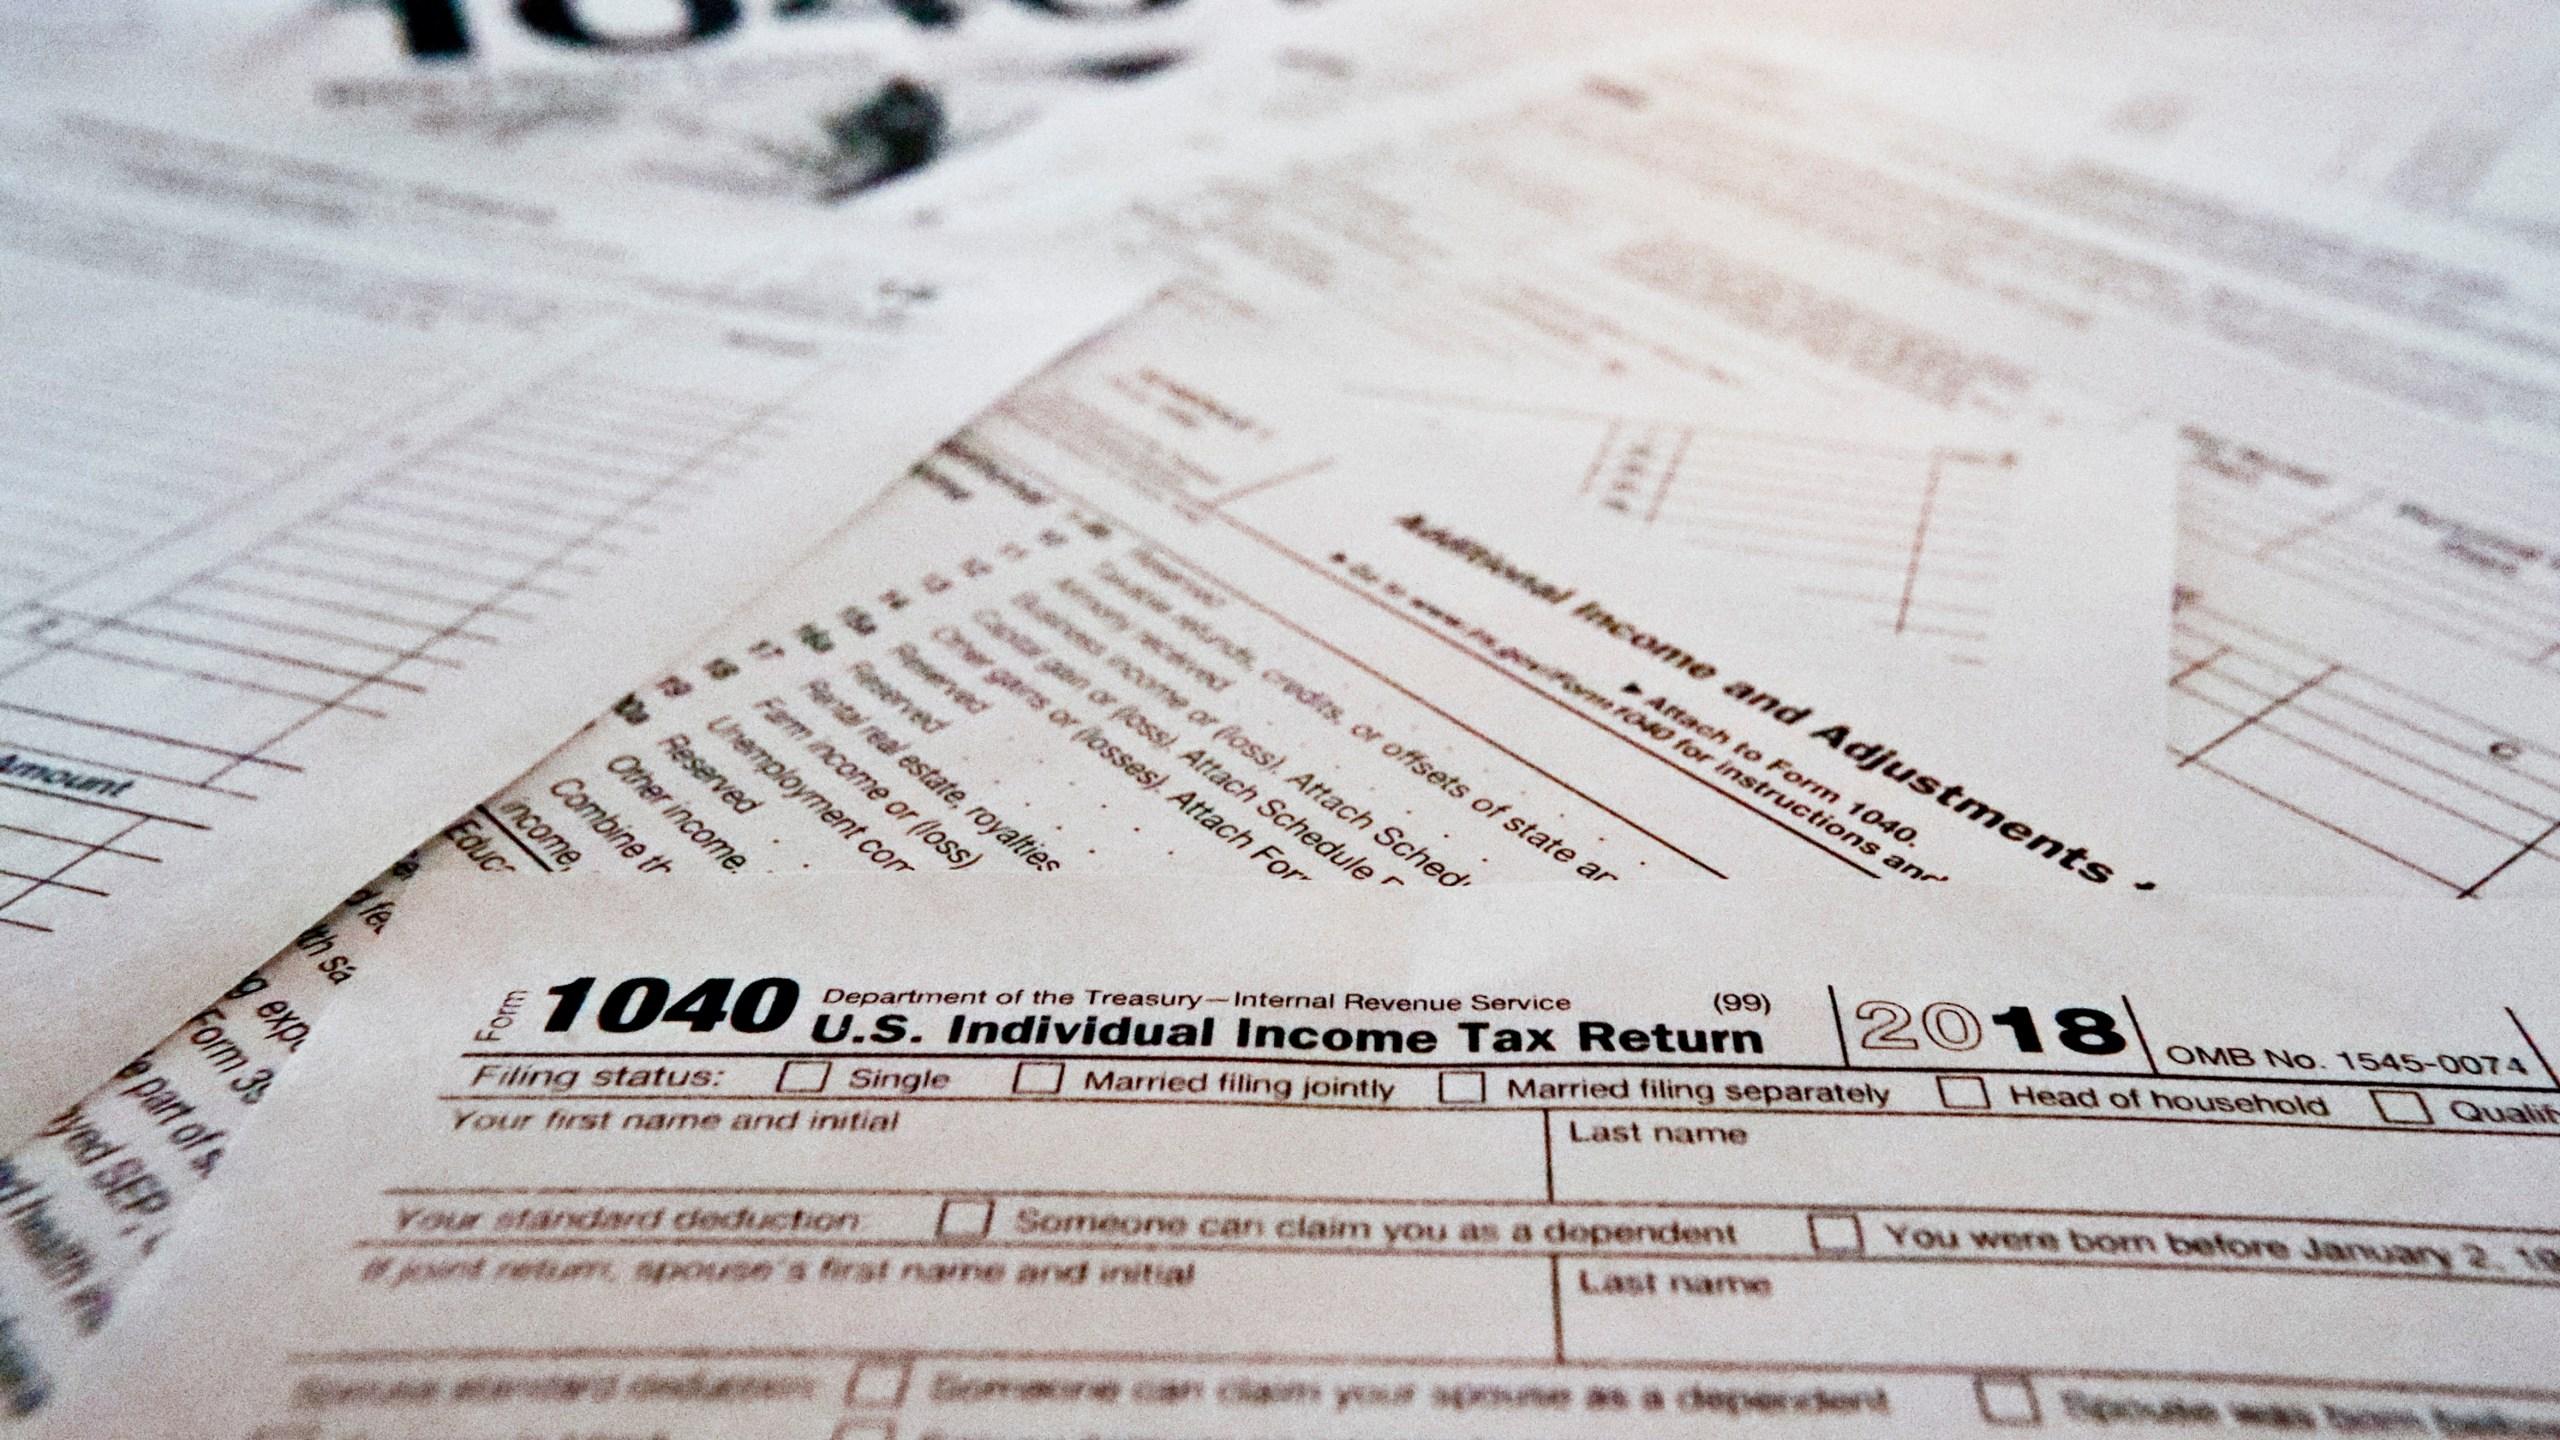 IRS_Tax_Refunds_48493-159532.jpg22520814